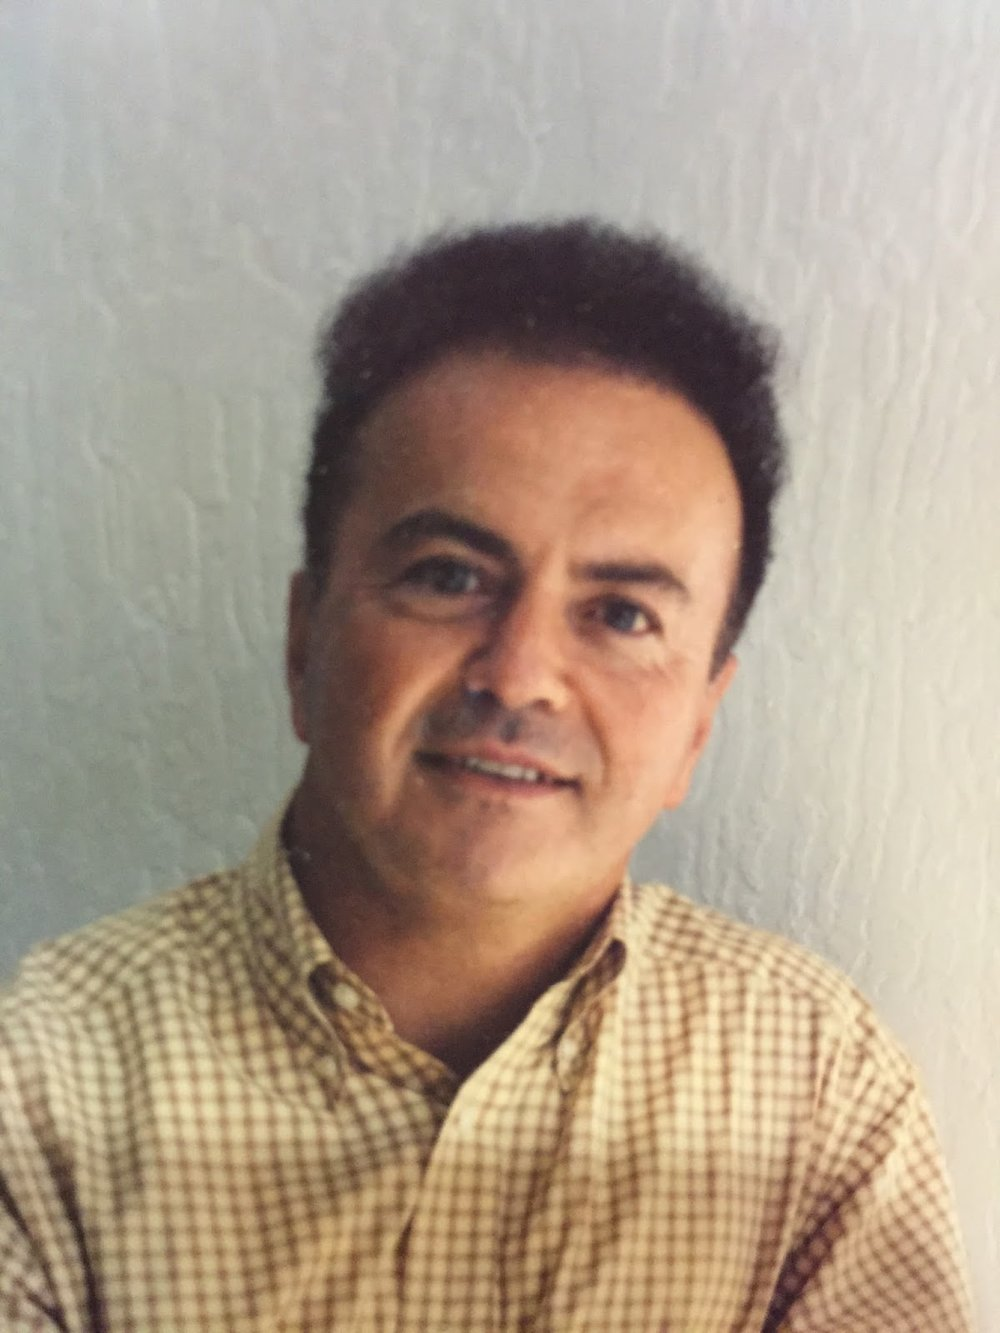 <span>MARCO DEMIROZ</span><span>VR Fund</span>